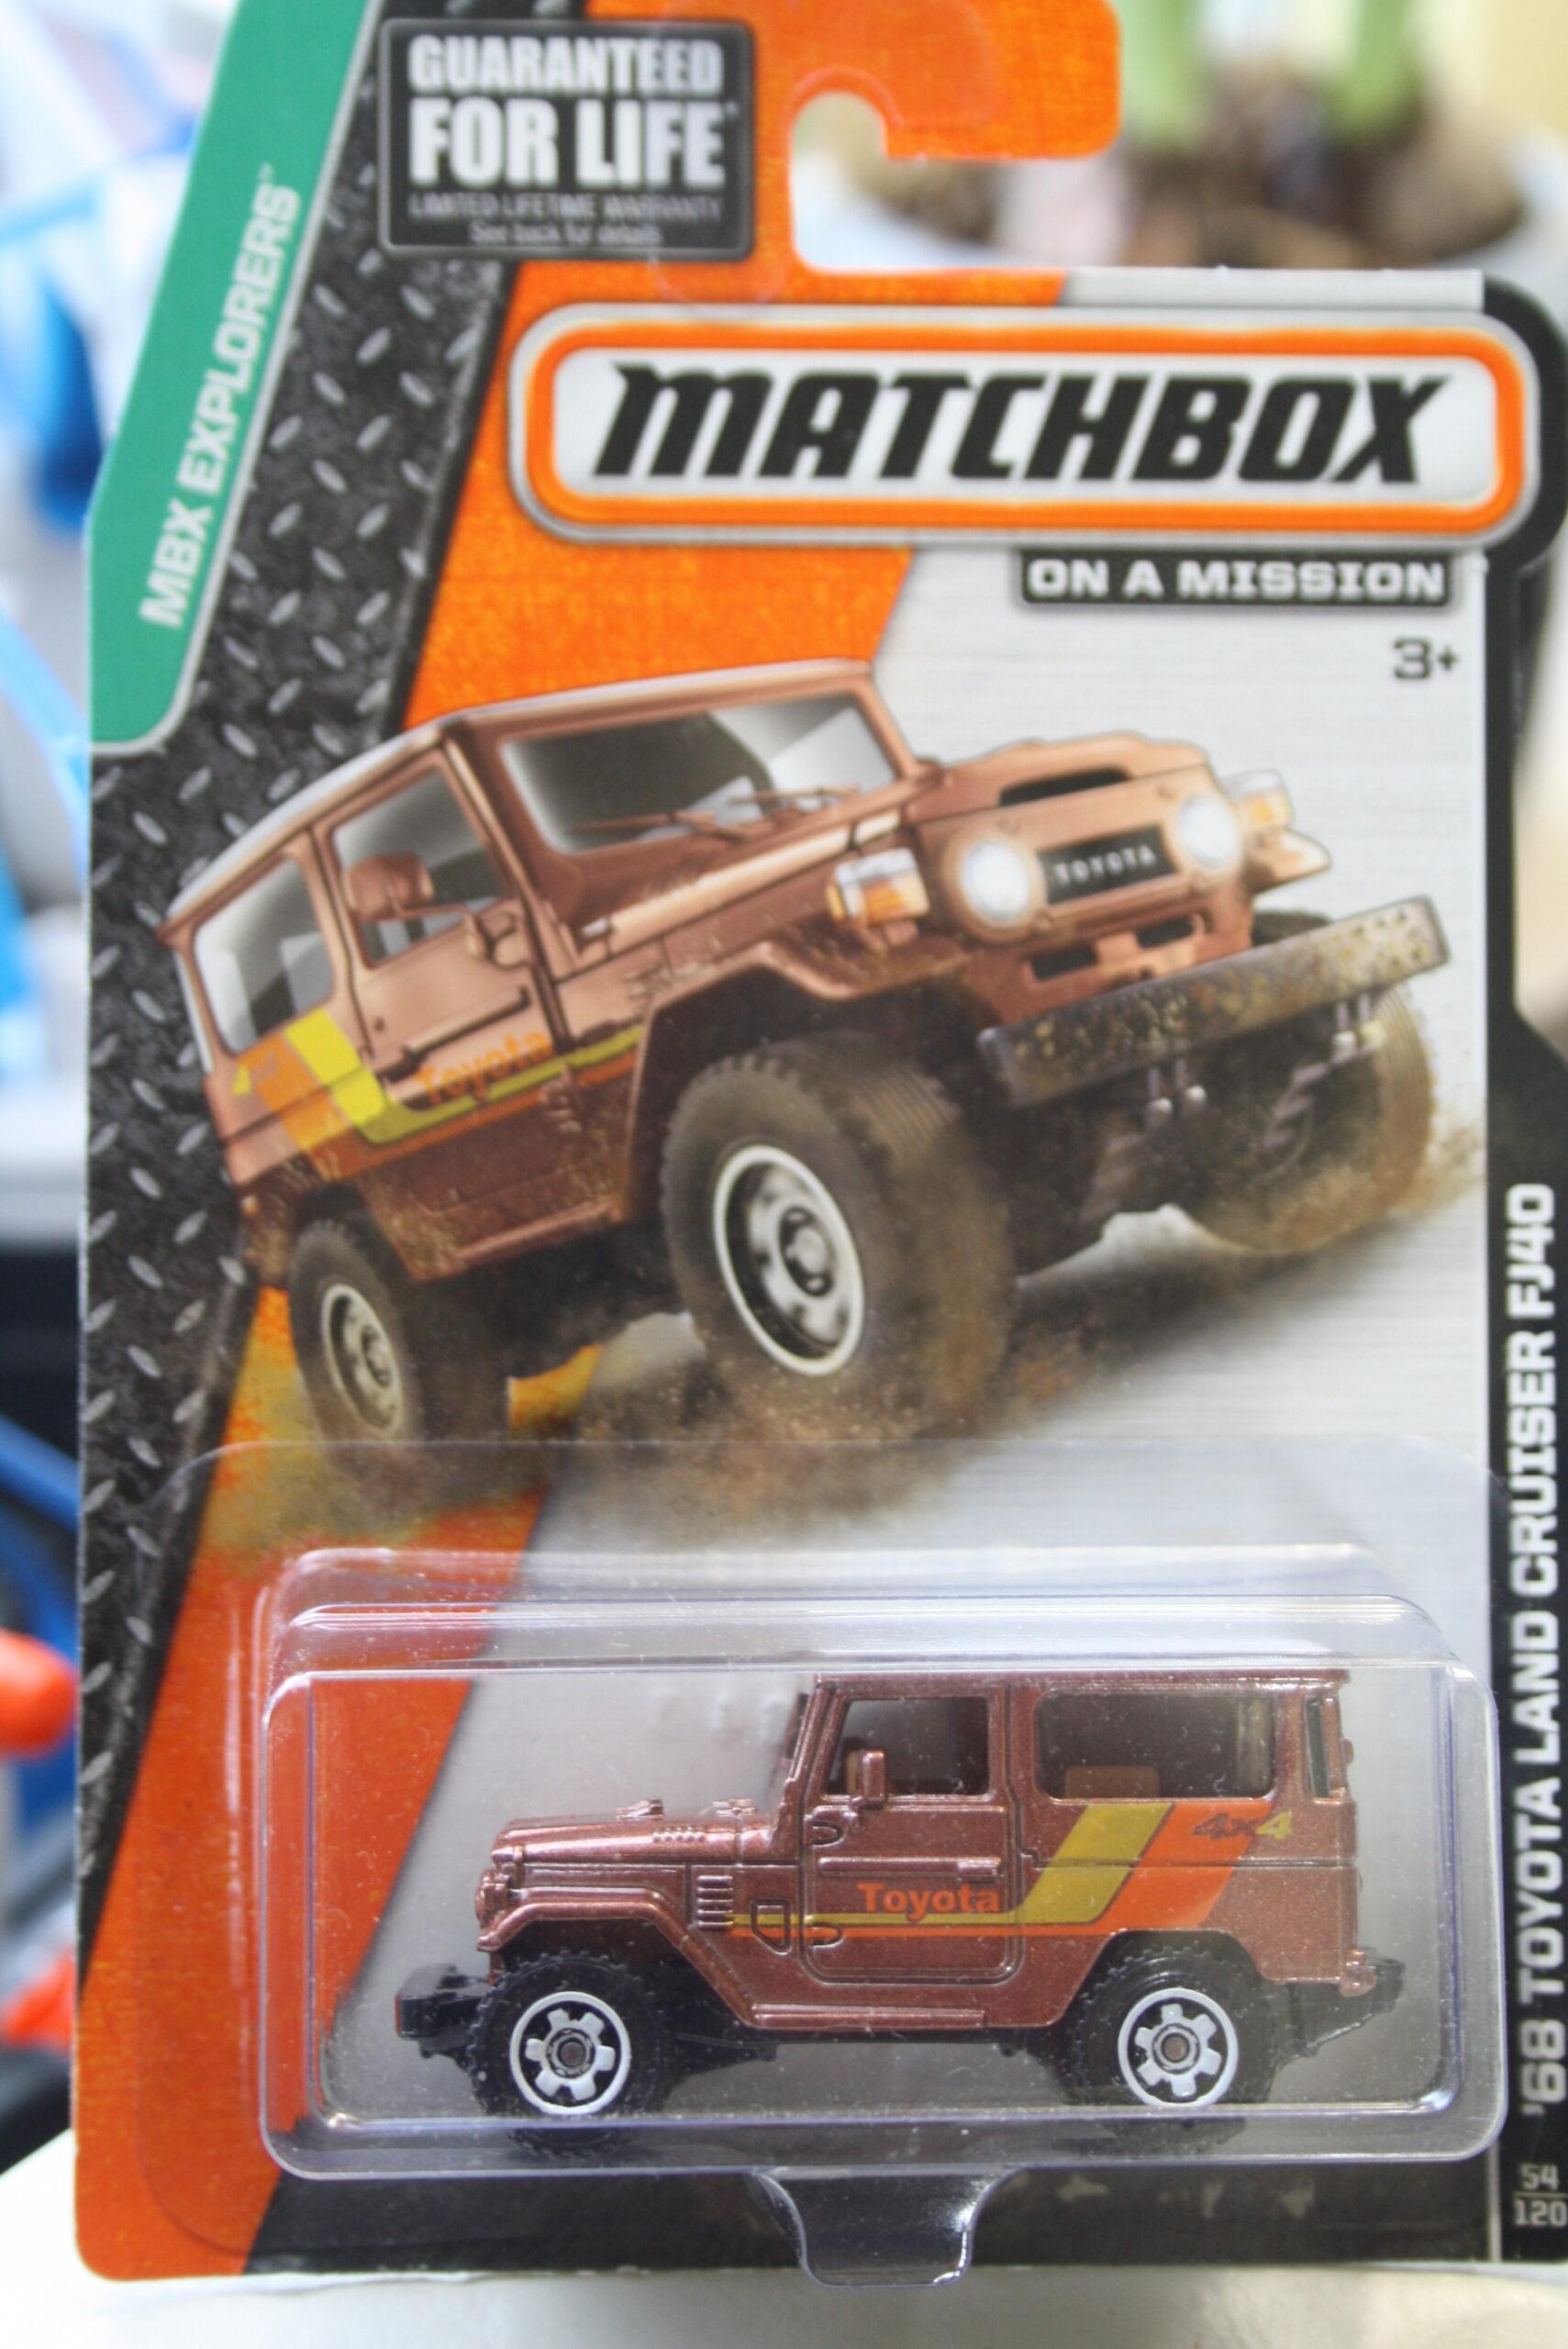 Matchbox Toyota Land Cruiser - Brown 1:64